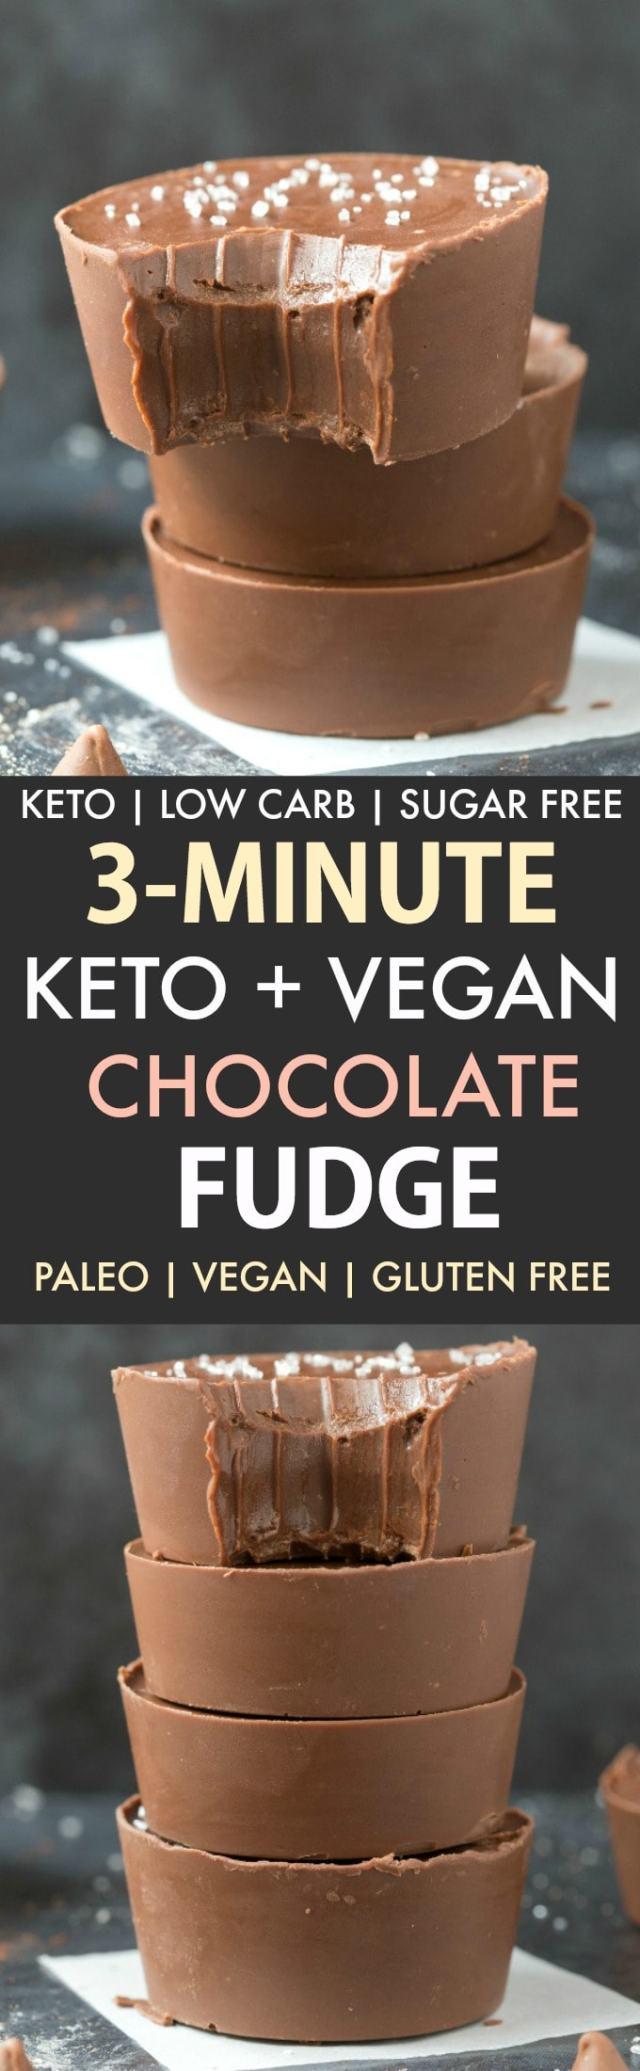 3-Minute Paleo Vegan Chocolate Fudge (Keto, Low Carb, Sugar Free)- An easy 3-ingredient recipe for smooth, creamy and fool-proof chocolate keto fat bomb fudge made with no dairy, no sugar, no condensed milk. #ketorecipe #fatbombs #dairyfree #paleo #vegan #keto | Recipe on thebigmansworld.com